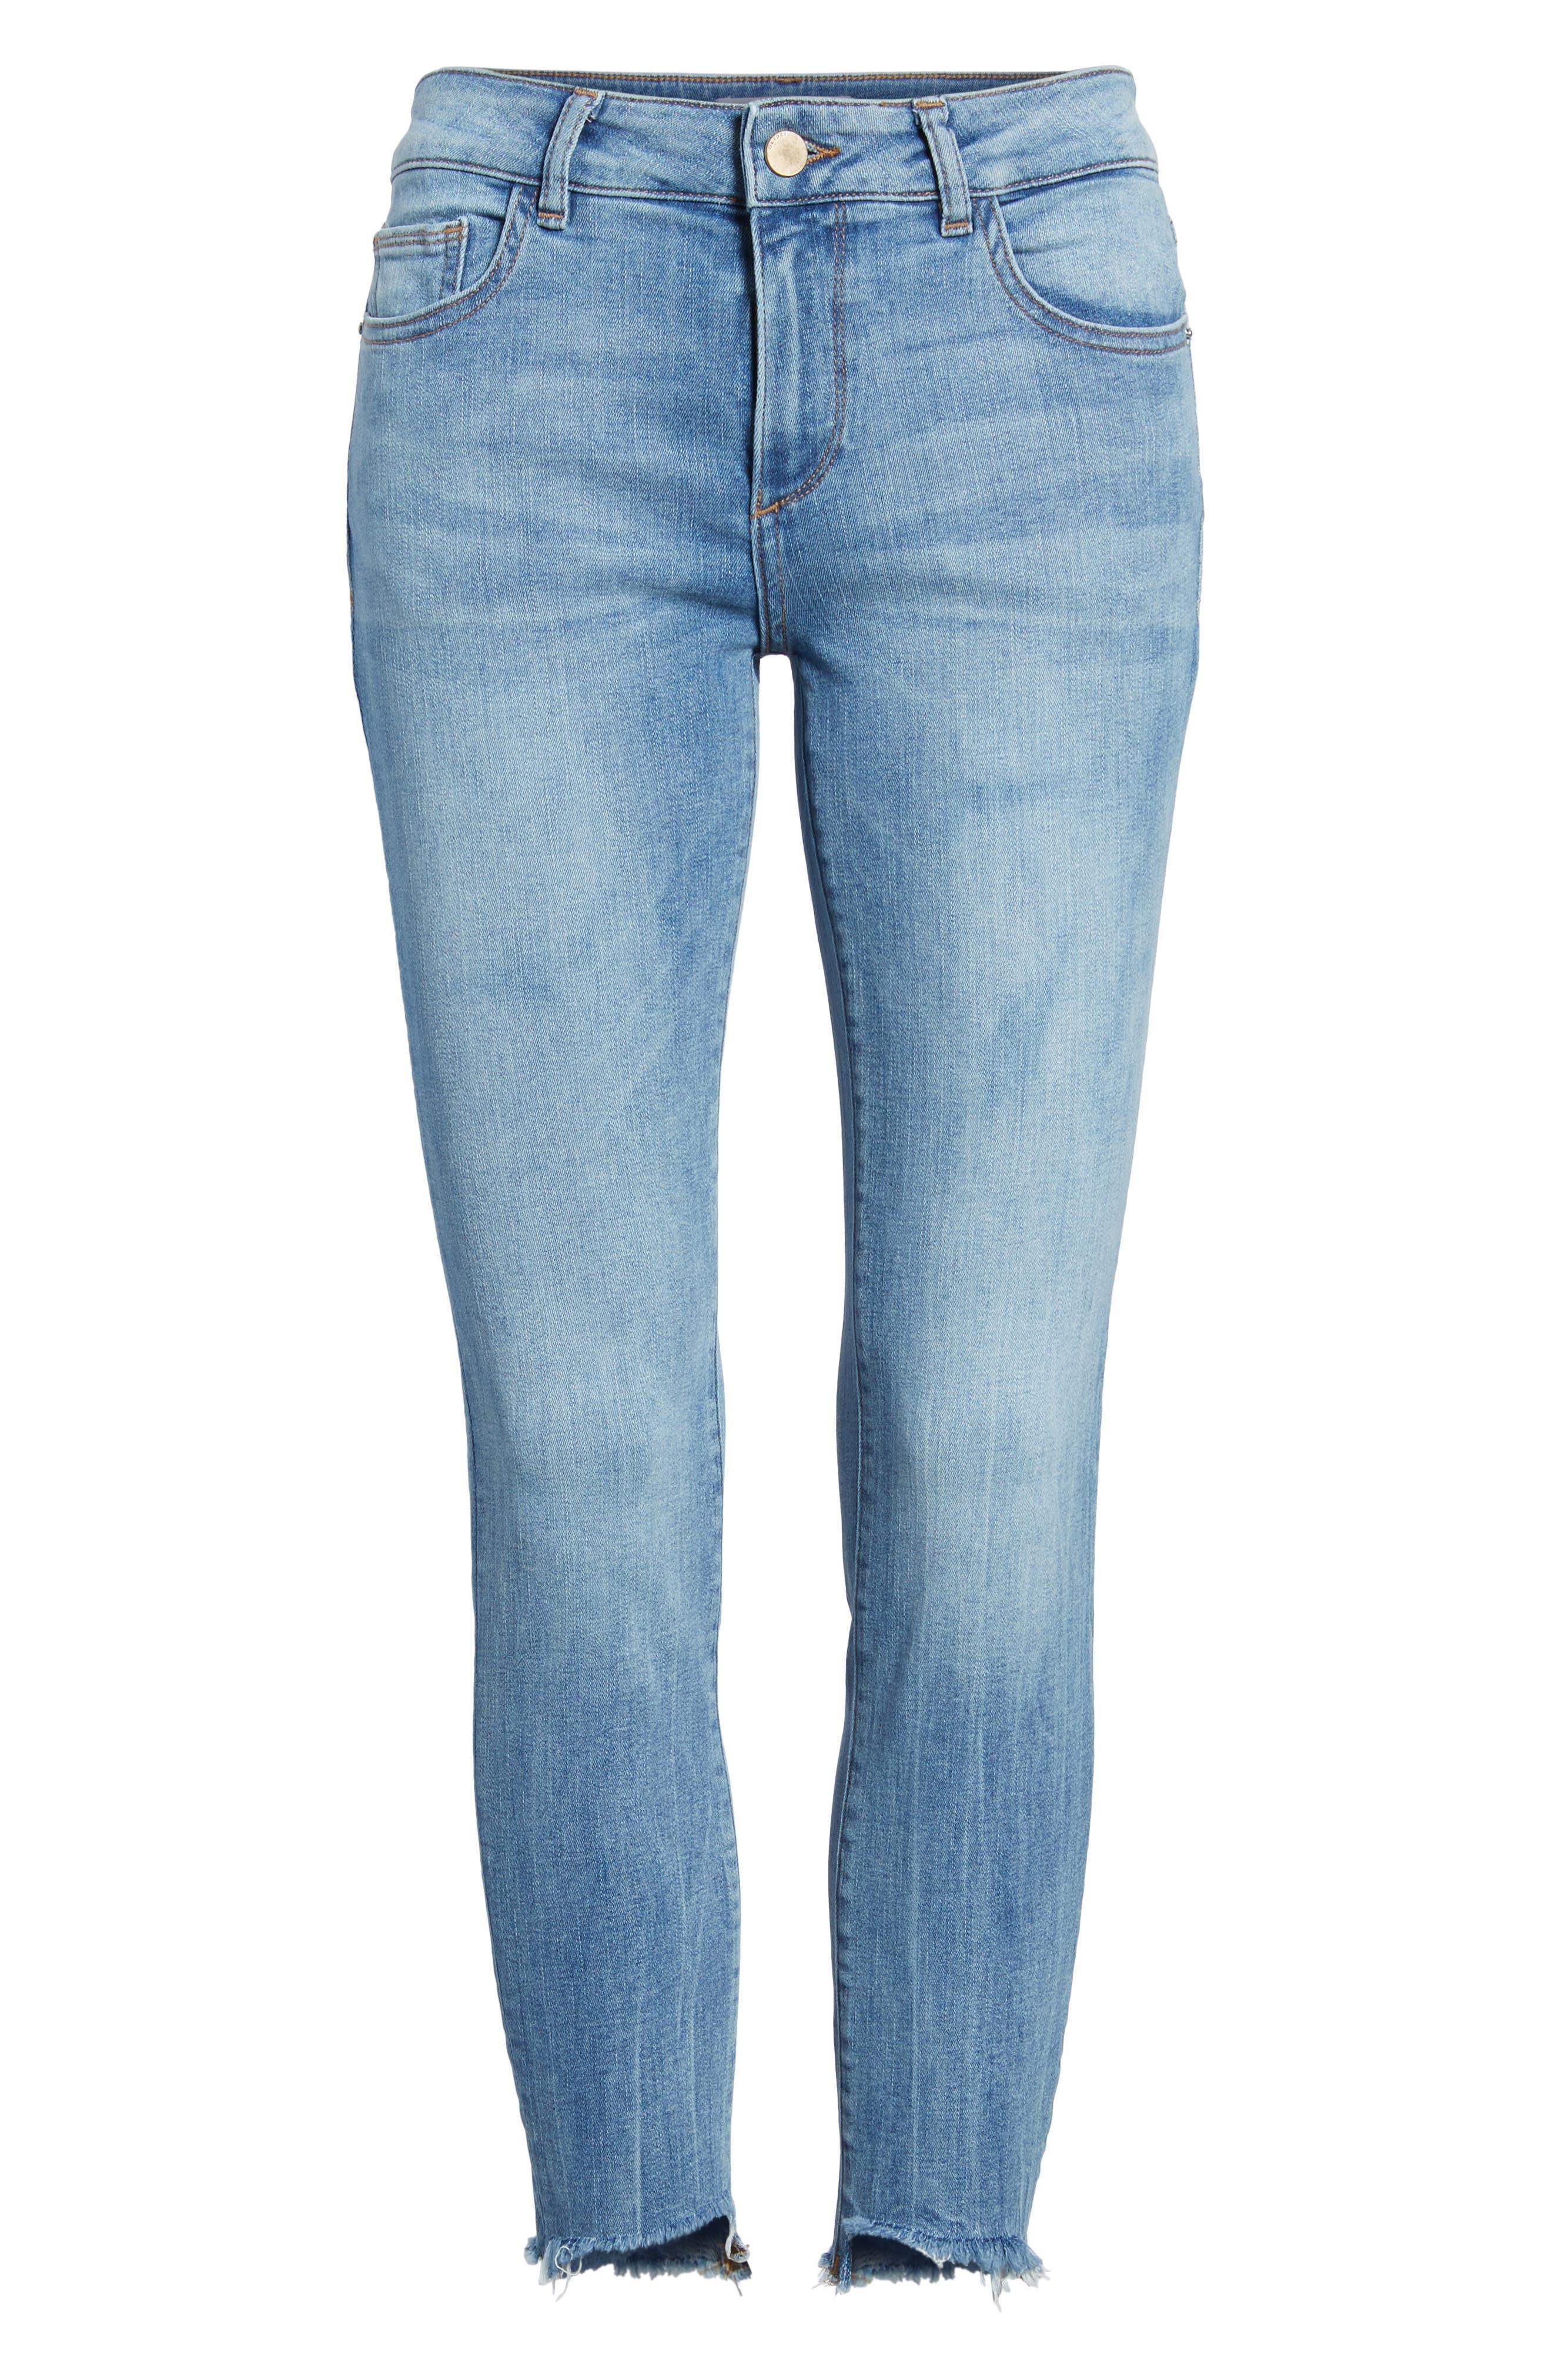 Florence Instasculpt Crop Skinny Jeans,                             Alternate thumbnail 7, color,                             Cavalier